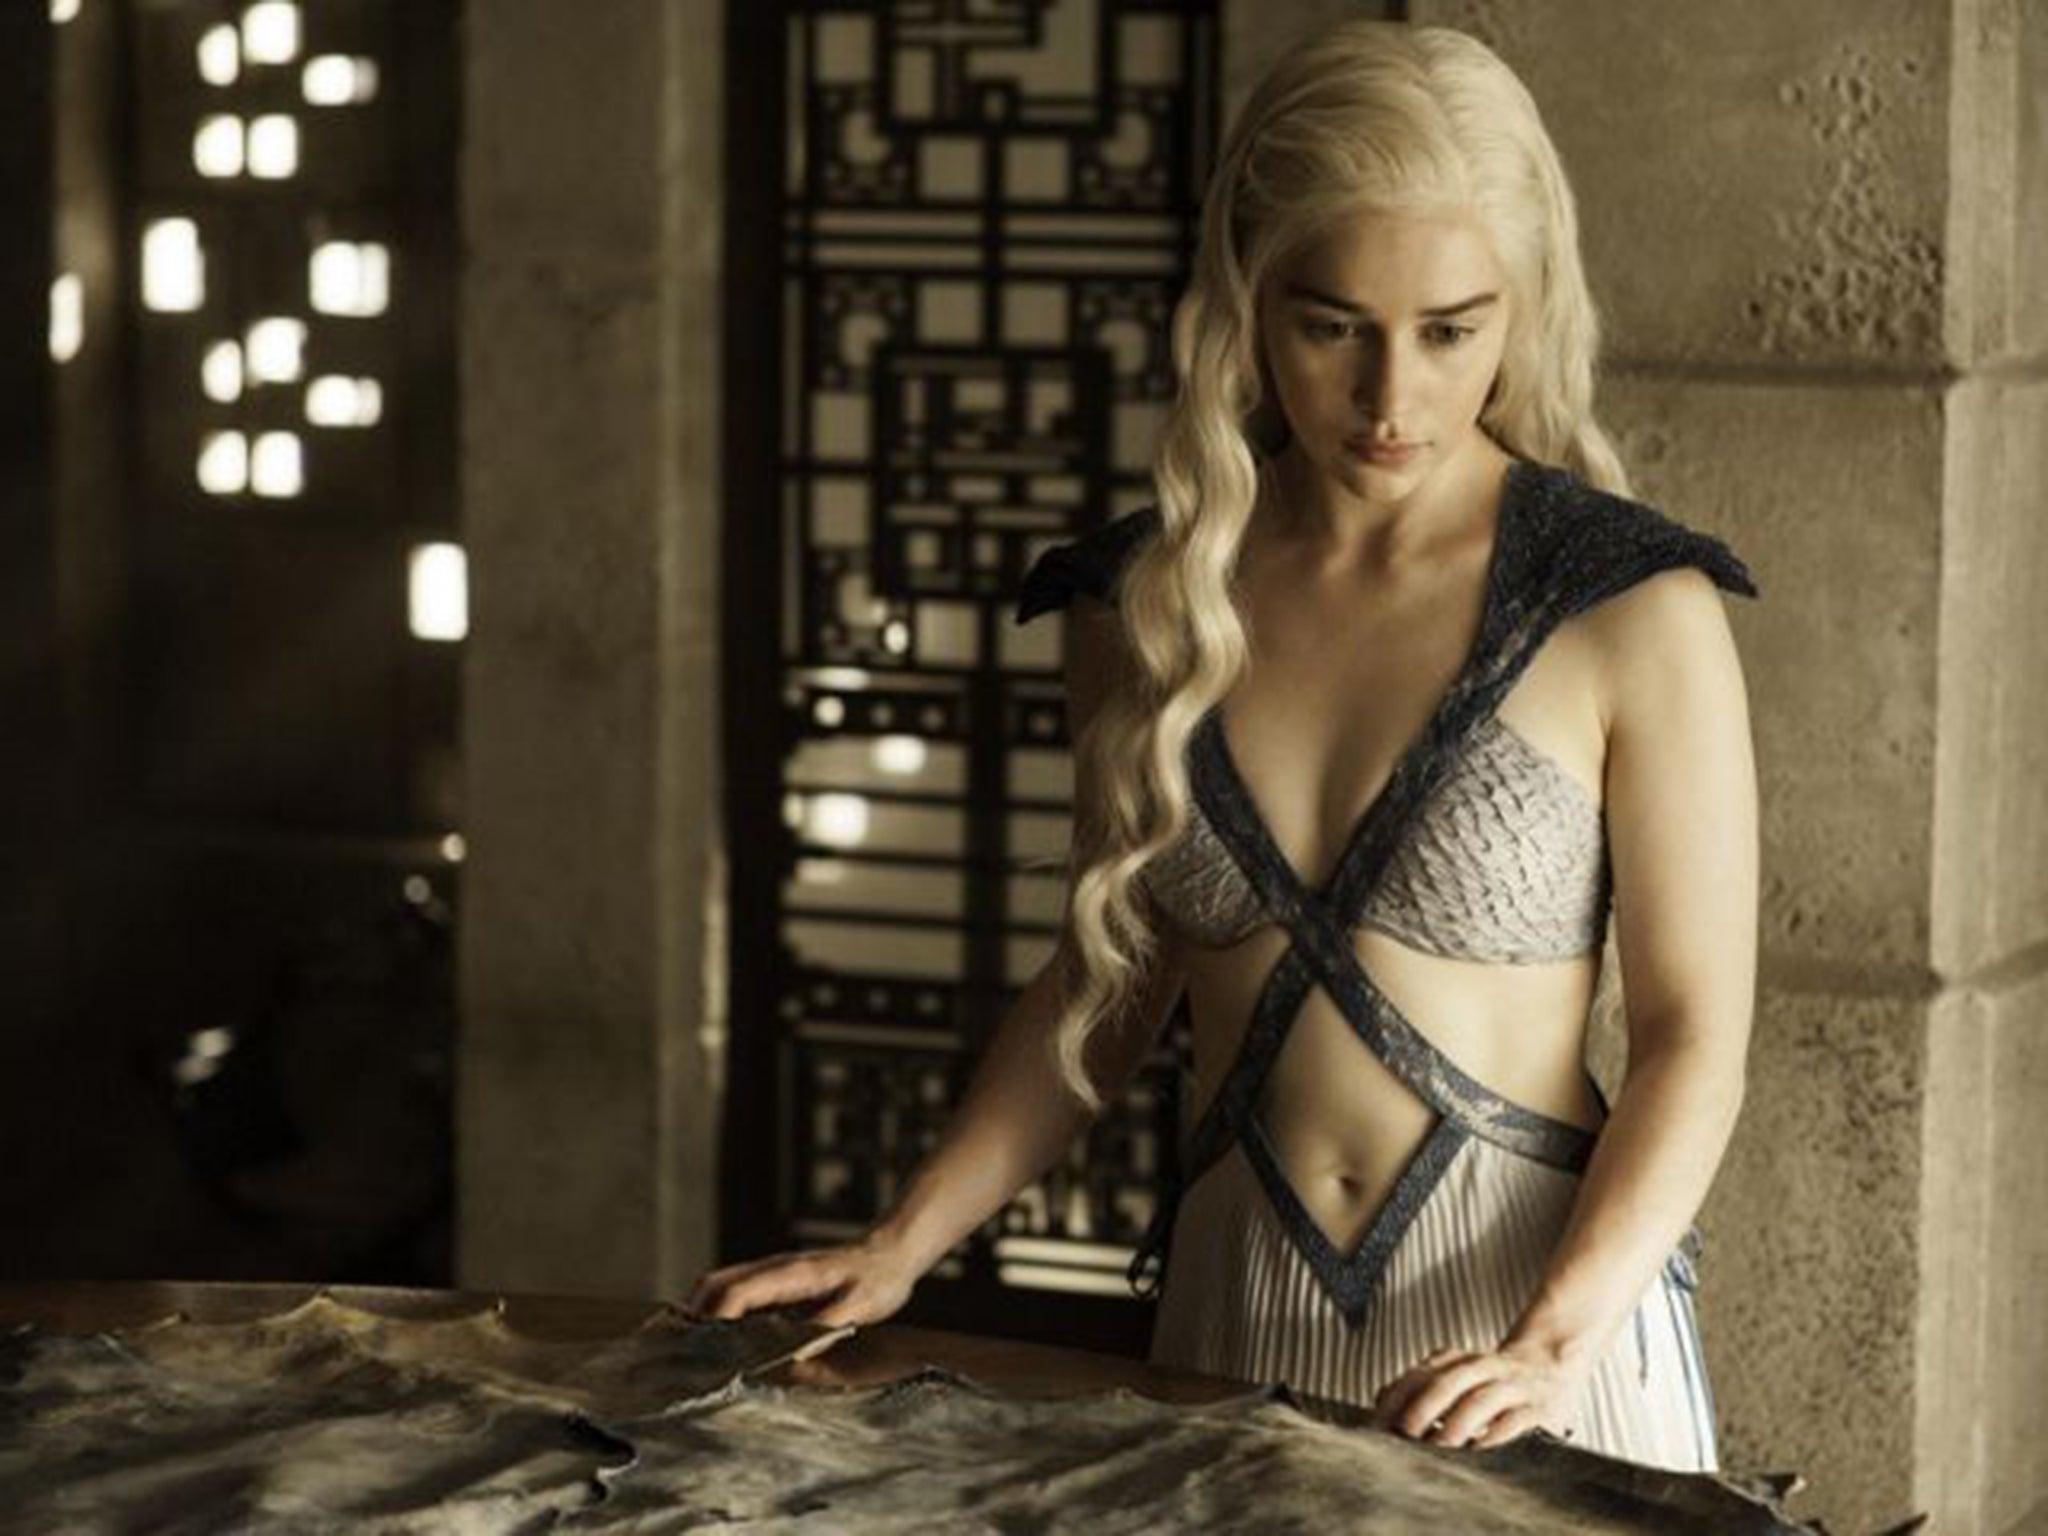 Emilia Clarke regrets watching Game Of Thrones nude